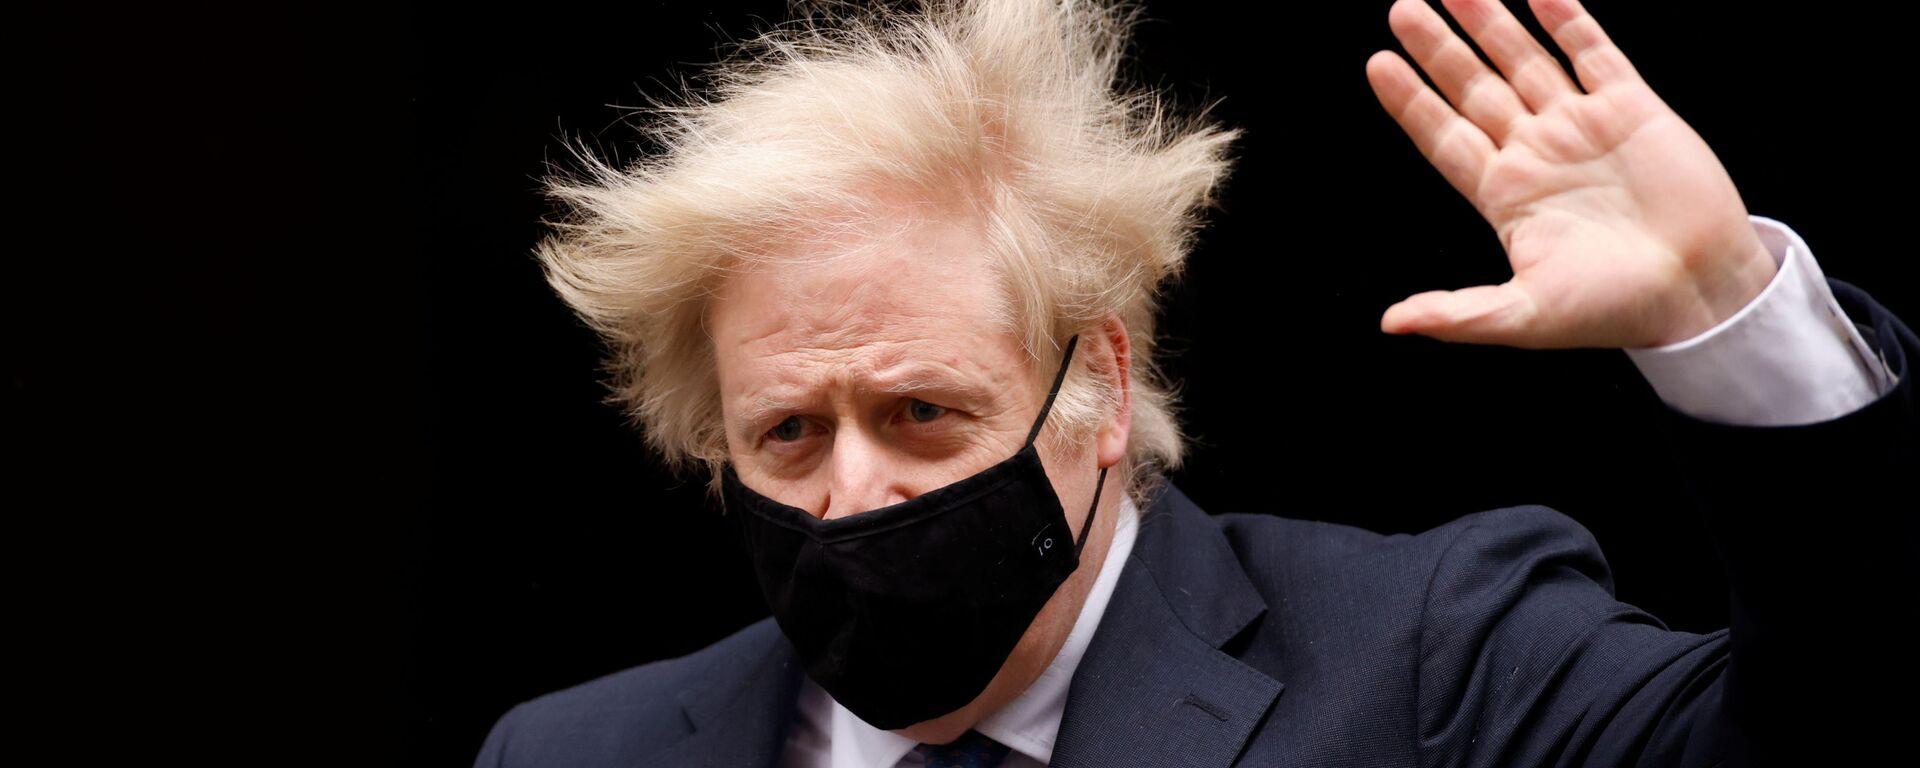 Britain's Prime Minister Boris Johnson gestures outside Downing Street in London, Britain, March 10, 2021 - Sputnik Italia, 1920, 15.06.2021